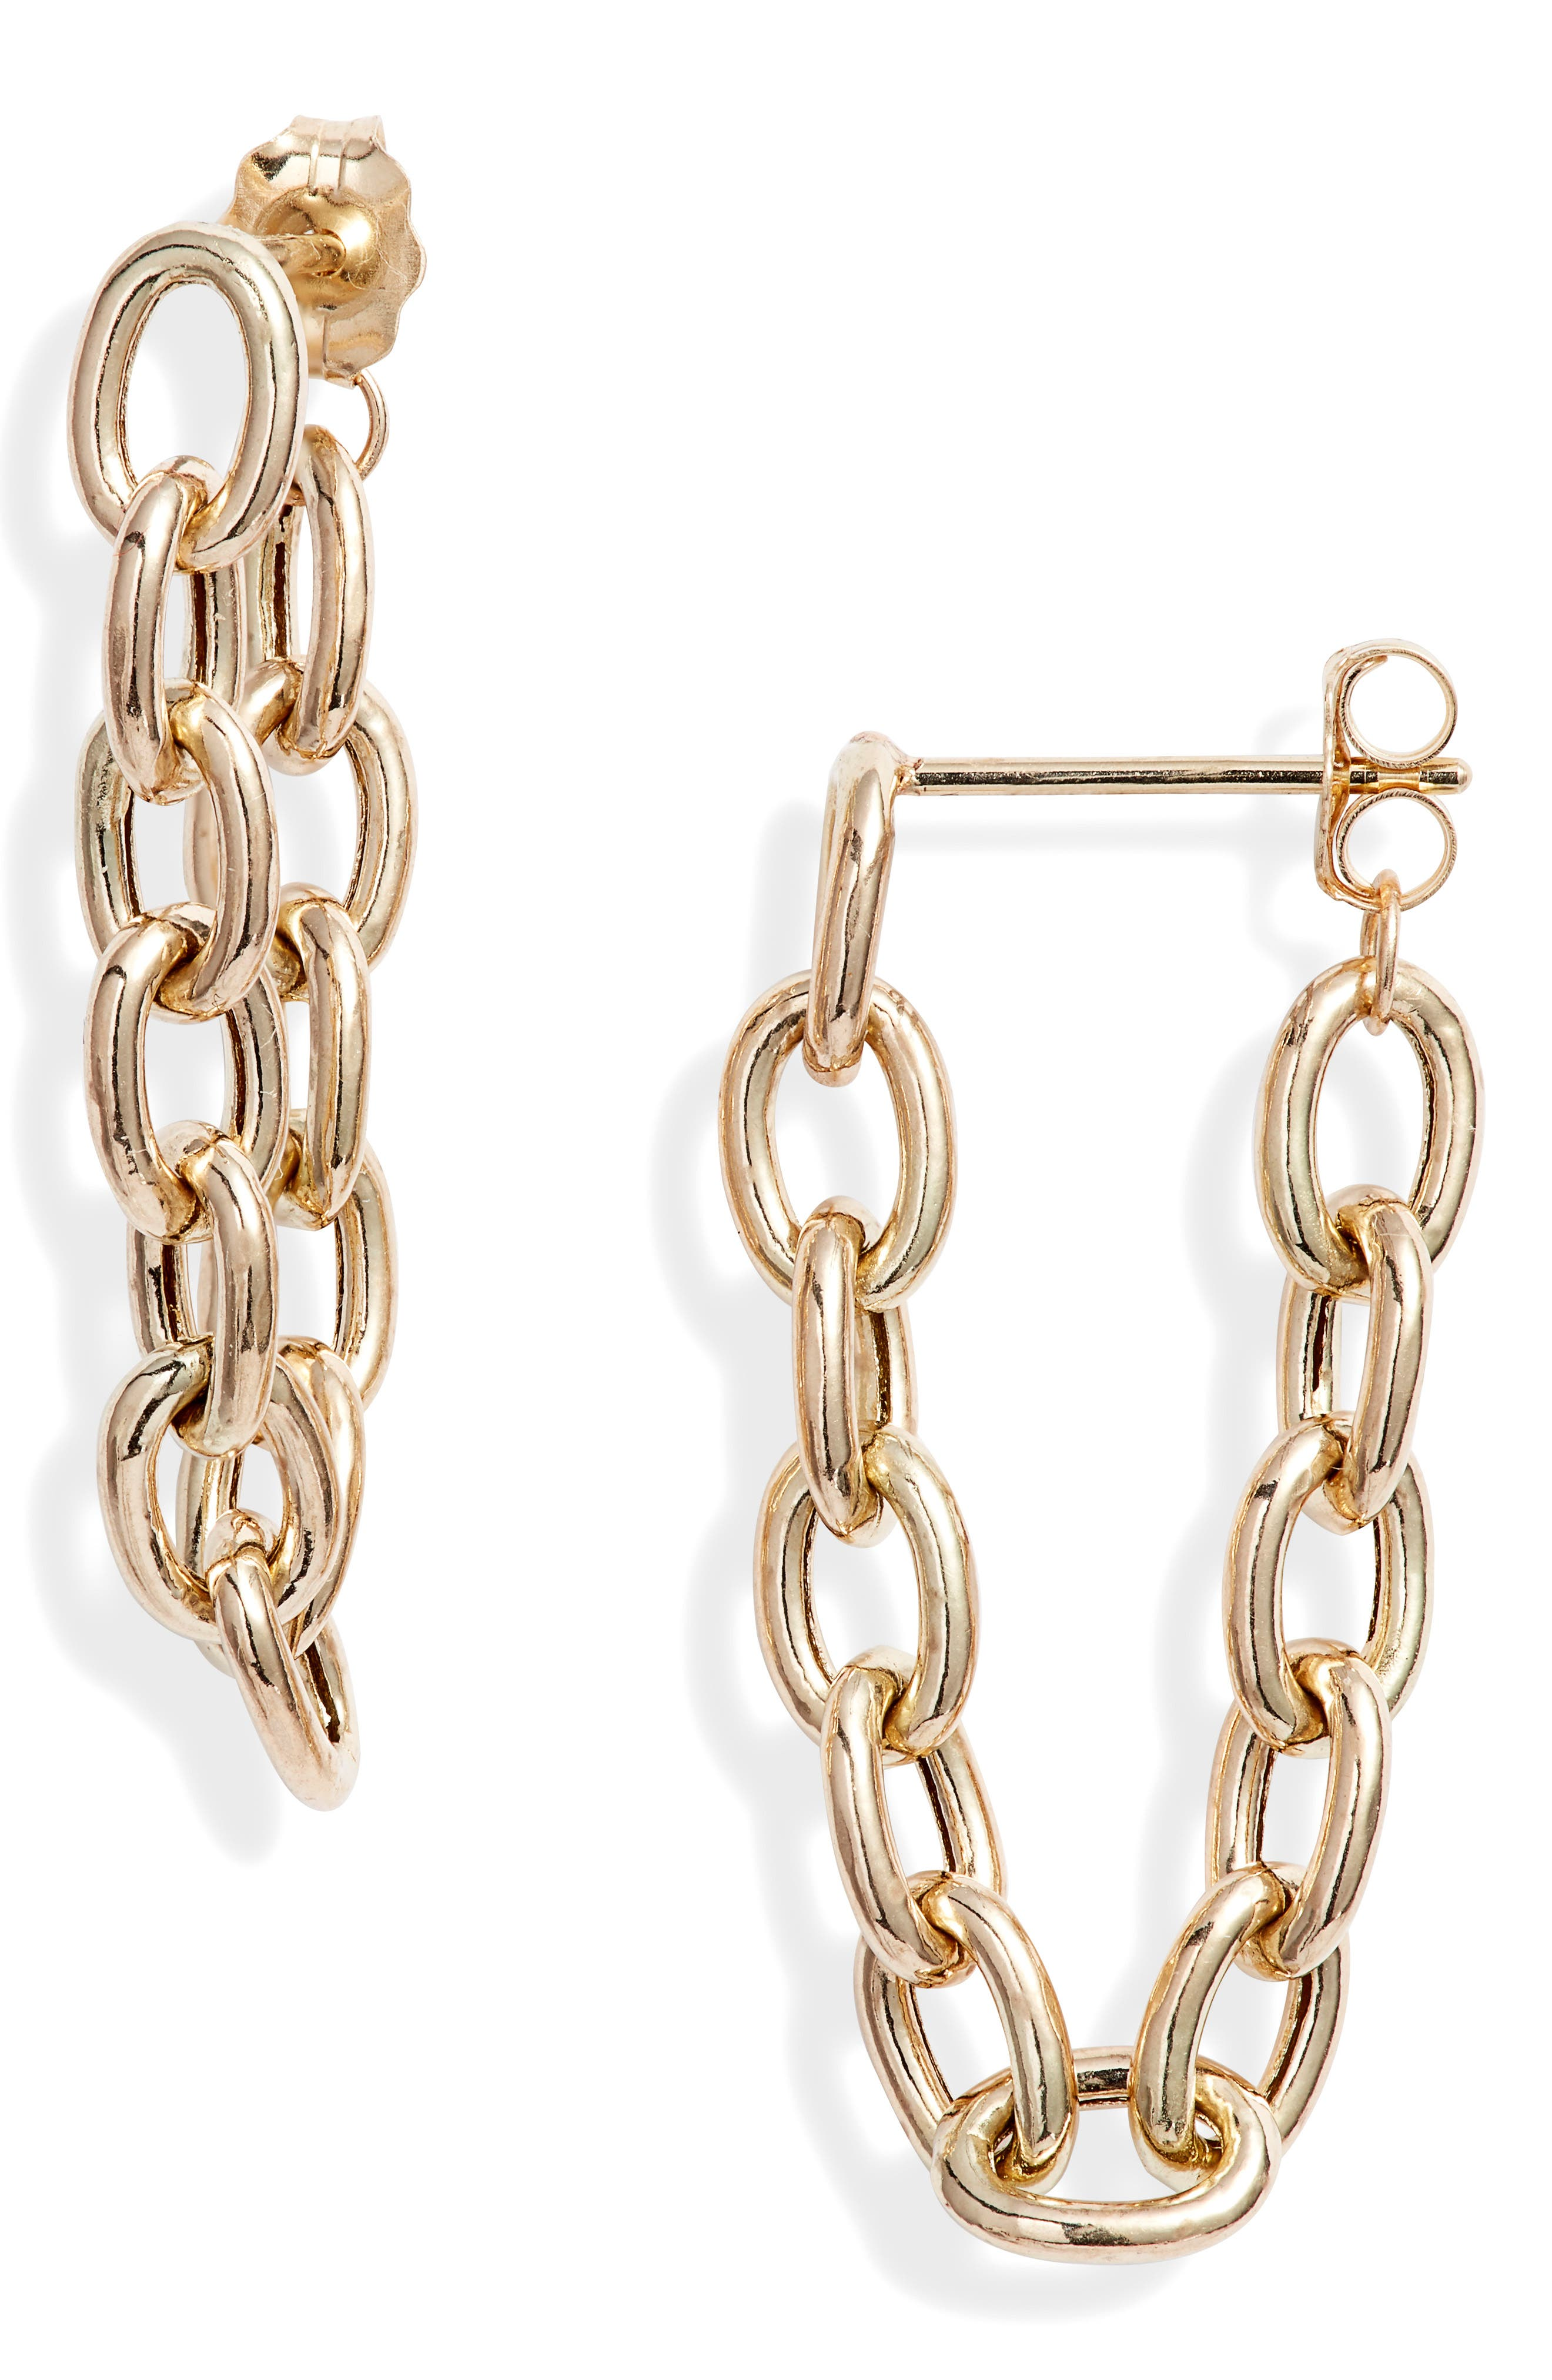 Zoe Chicco Big Oval Chain Earrings